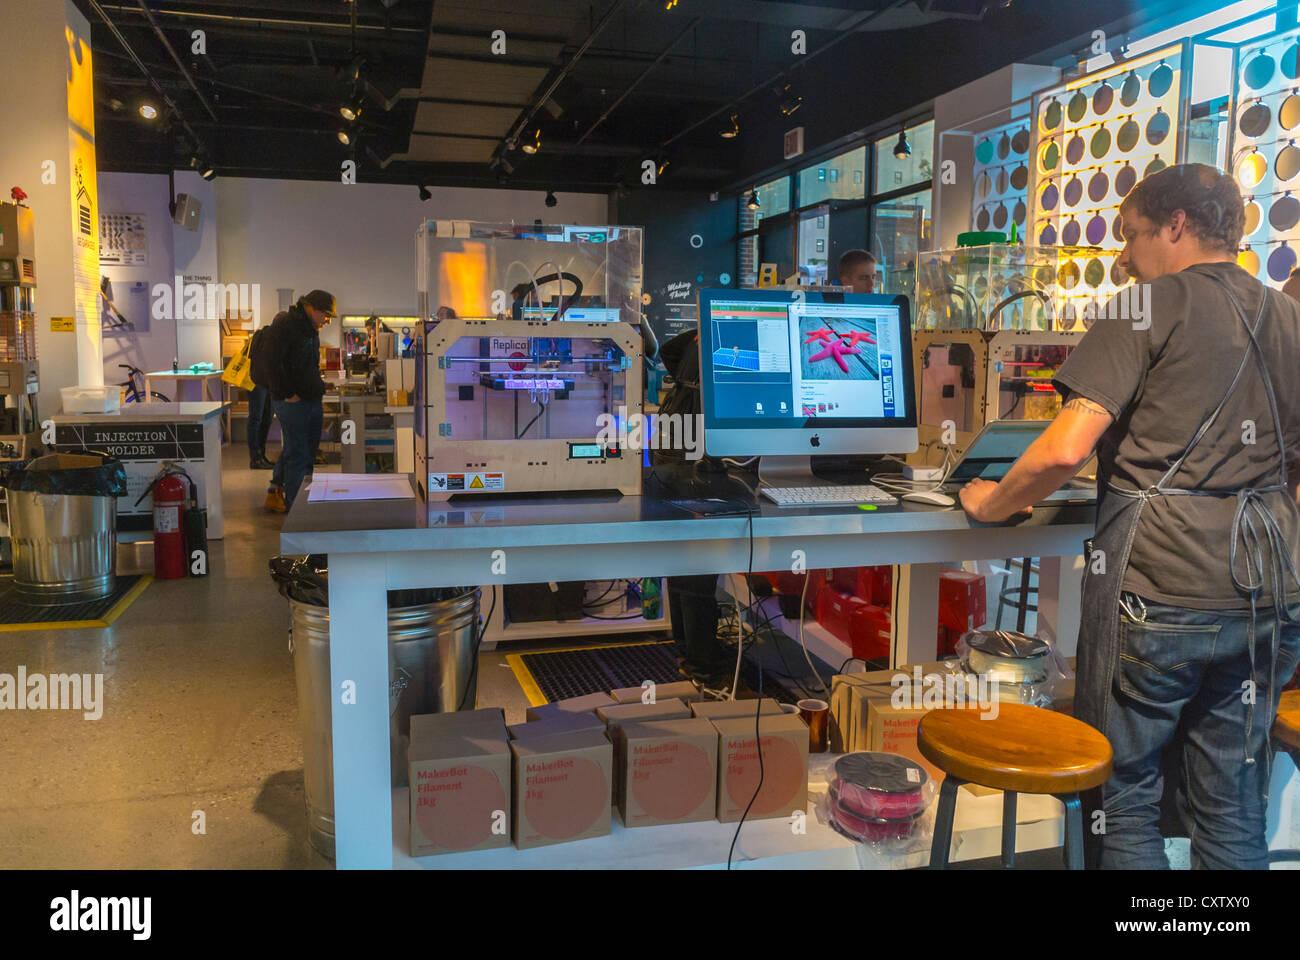 New York, NY, USA, Concept Store américain 'cas' un partenariat avec 'GE' Garages pour célébrer Photo Stock